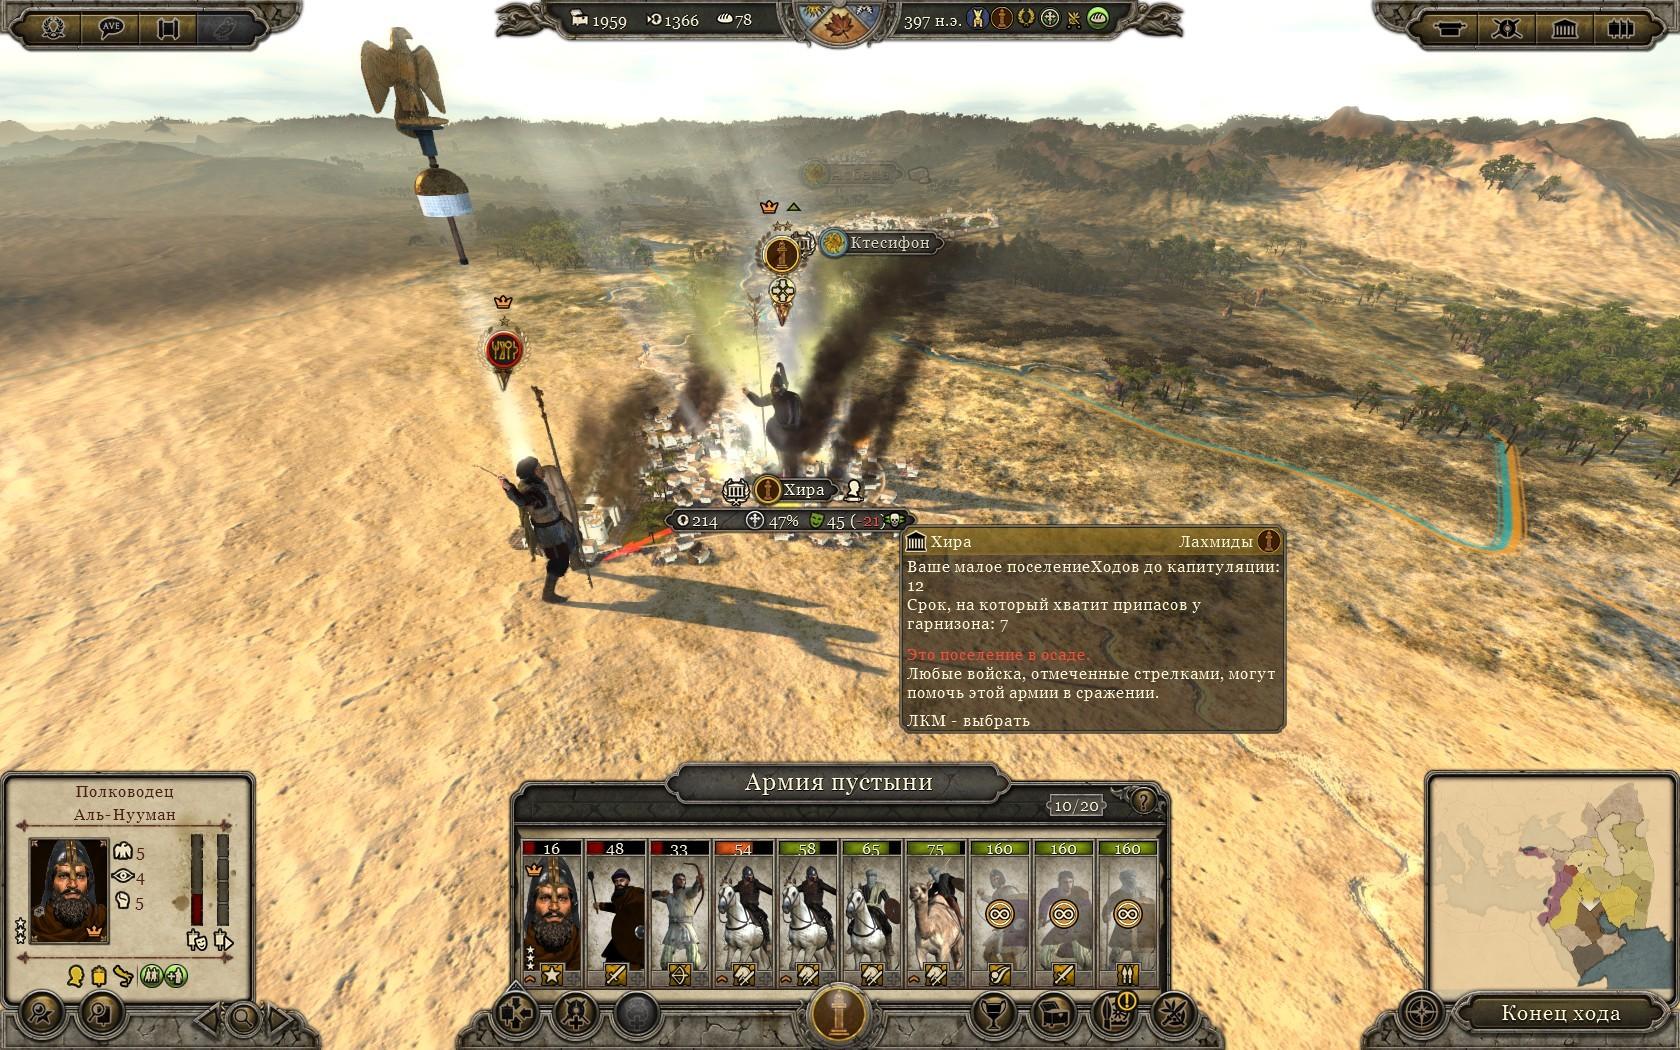 total_war1442578903__397__.jpg